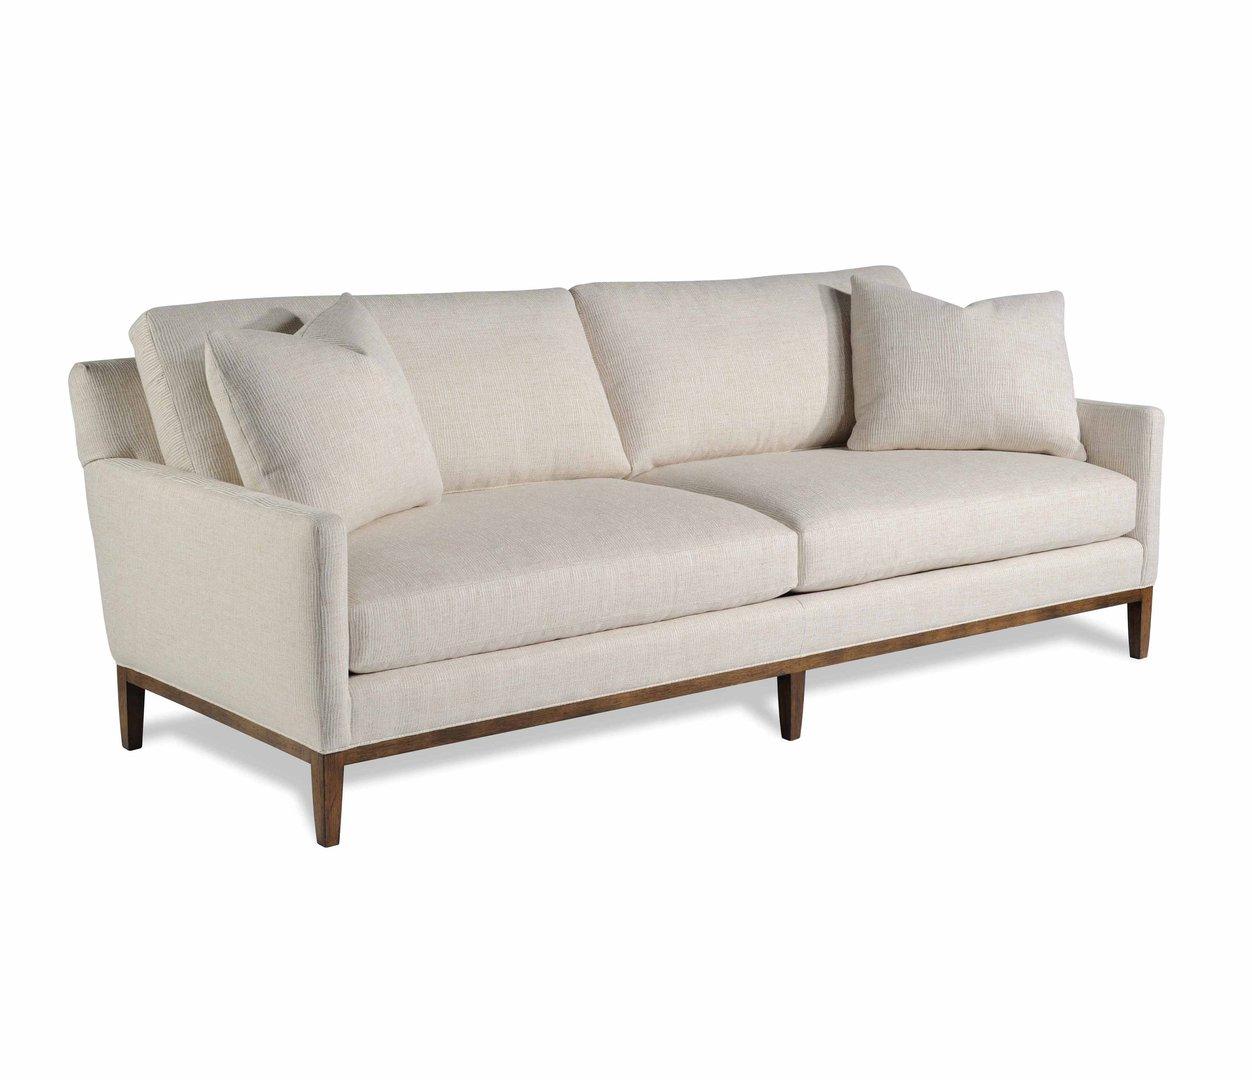 Holiday Sofa Image